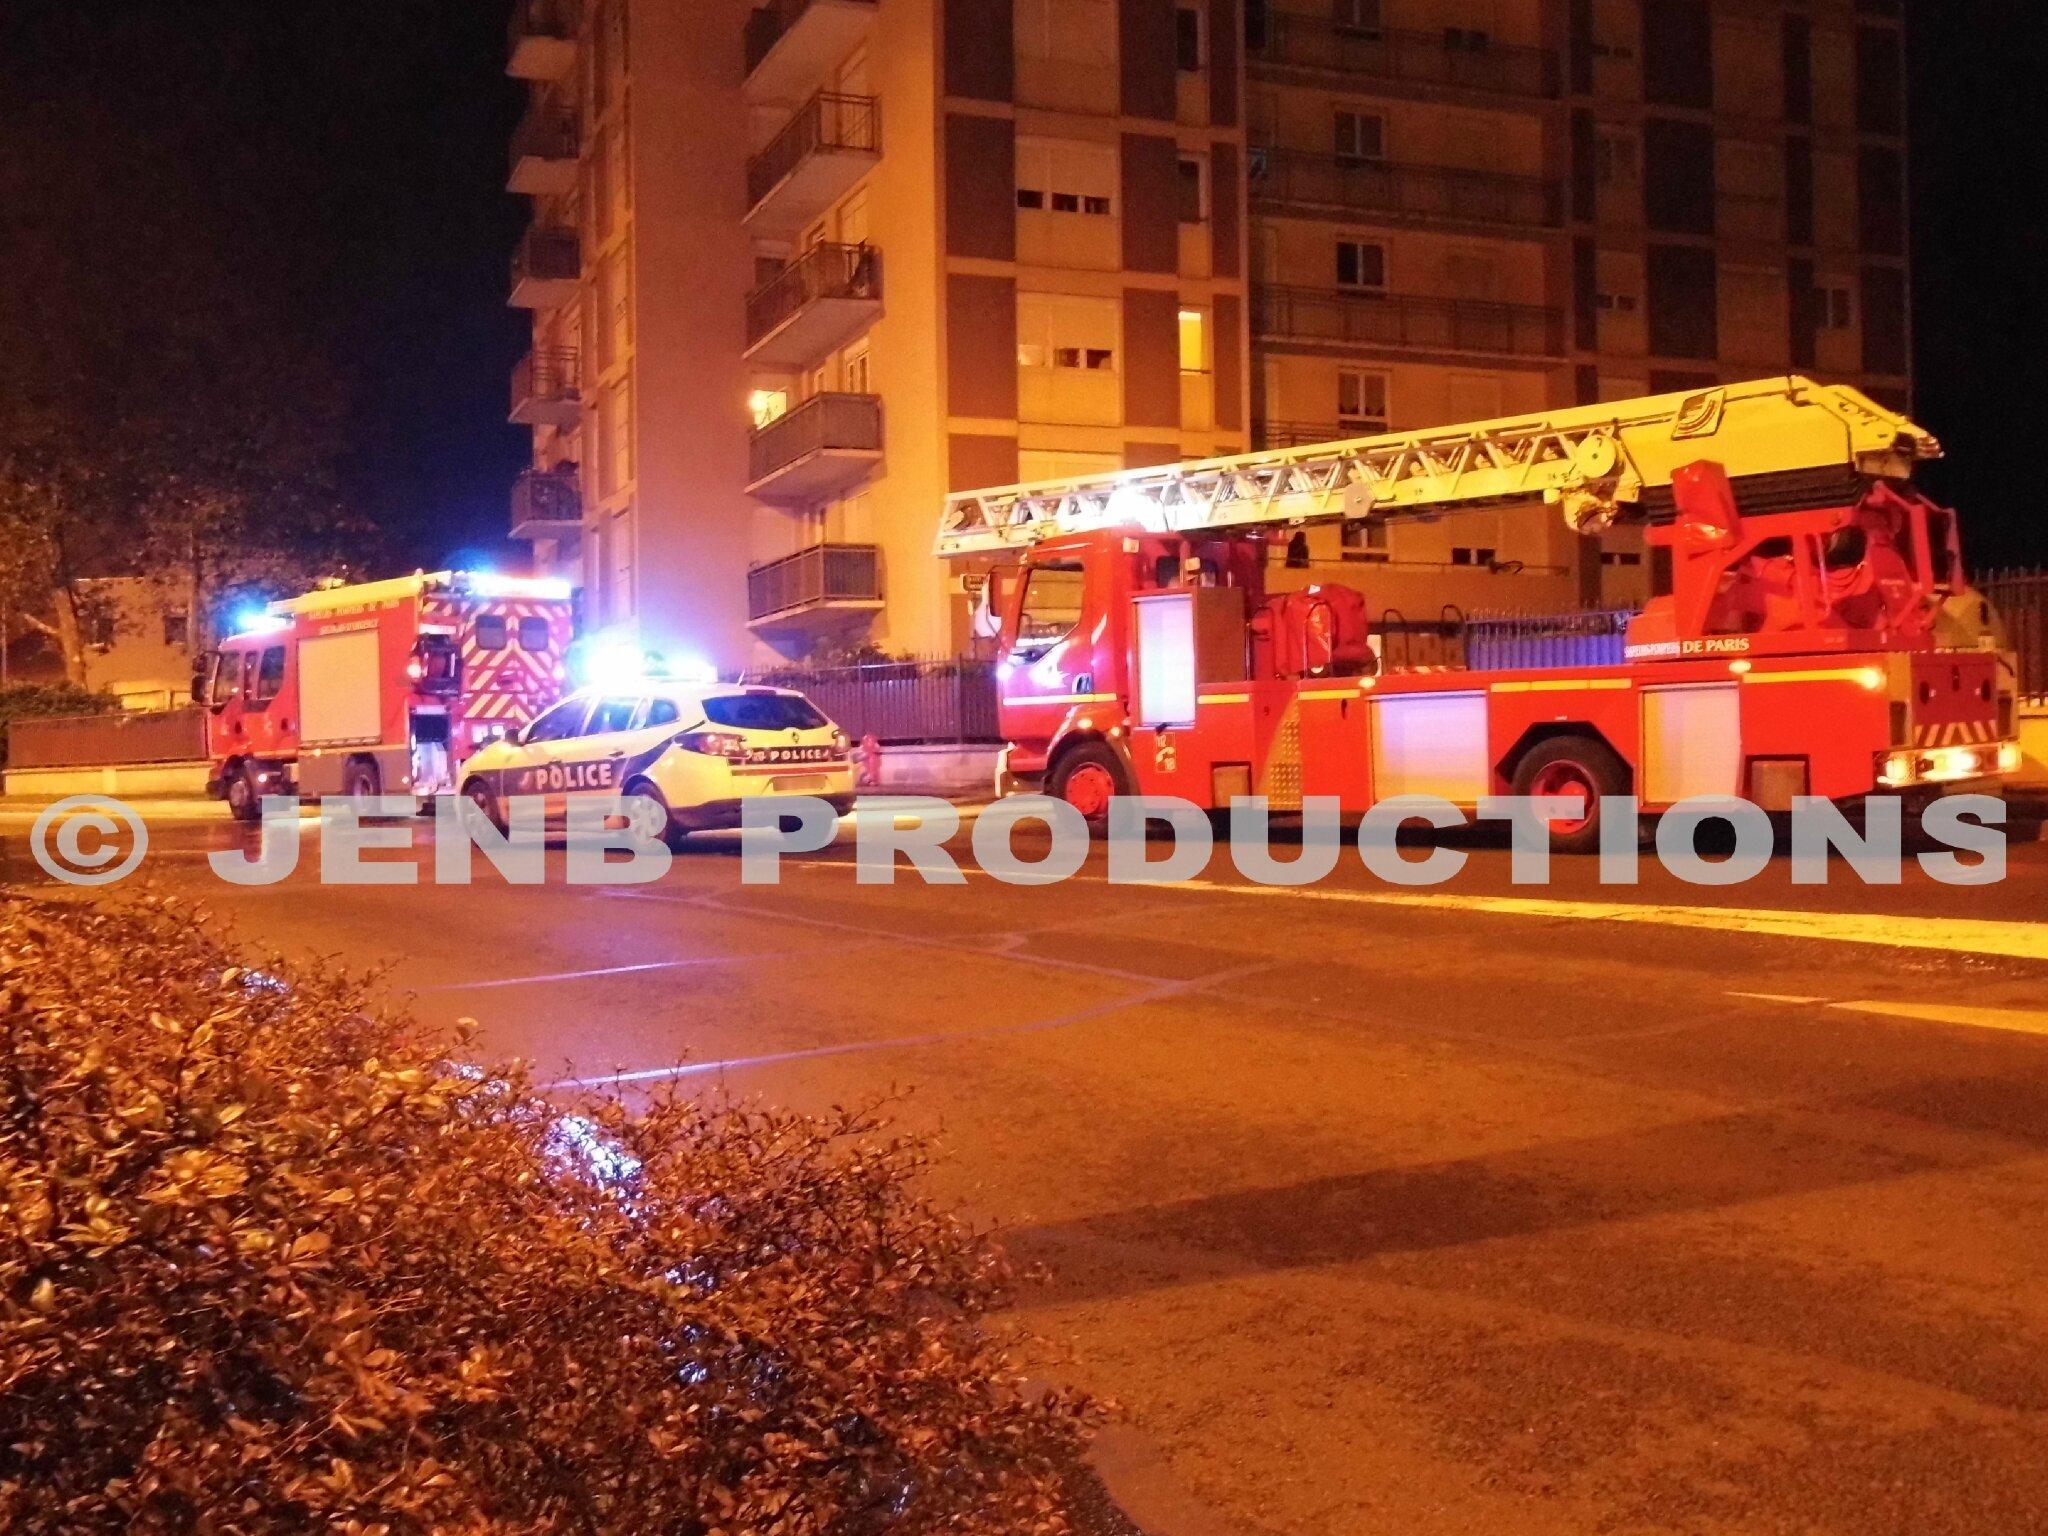 2013 10 30 feu de voiture Noisy-le-Sec © JENB Productions (9b)